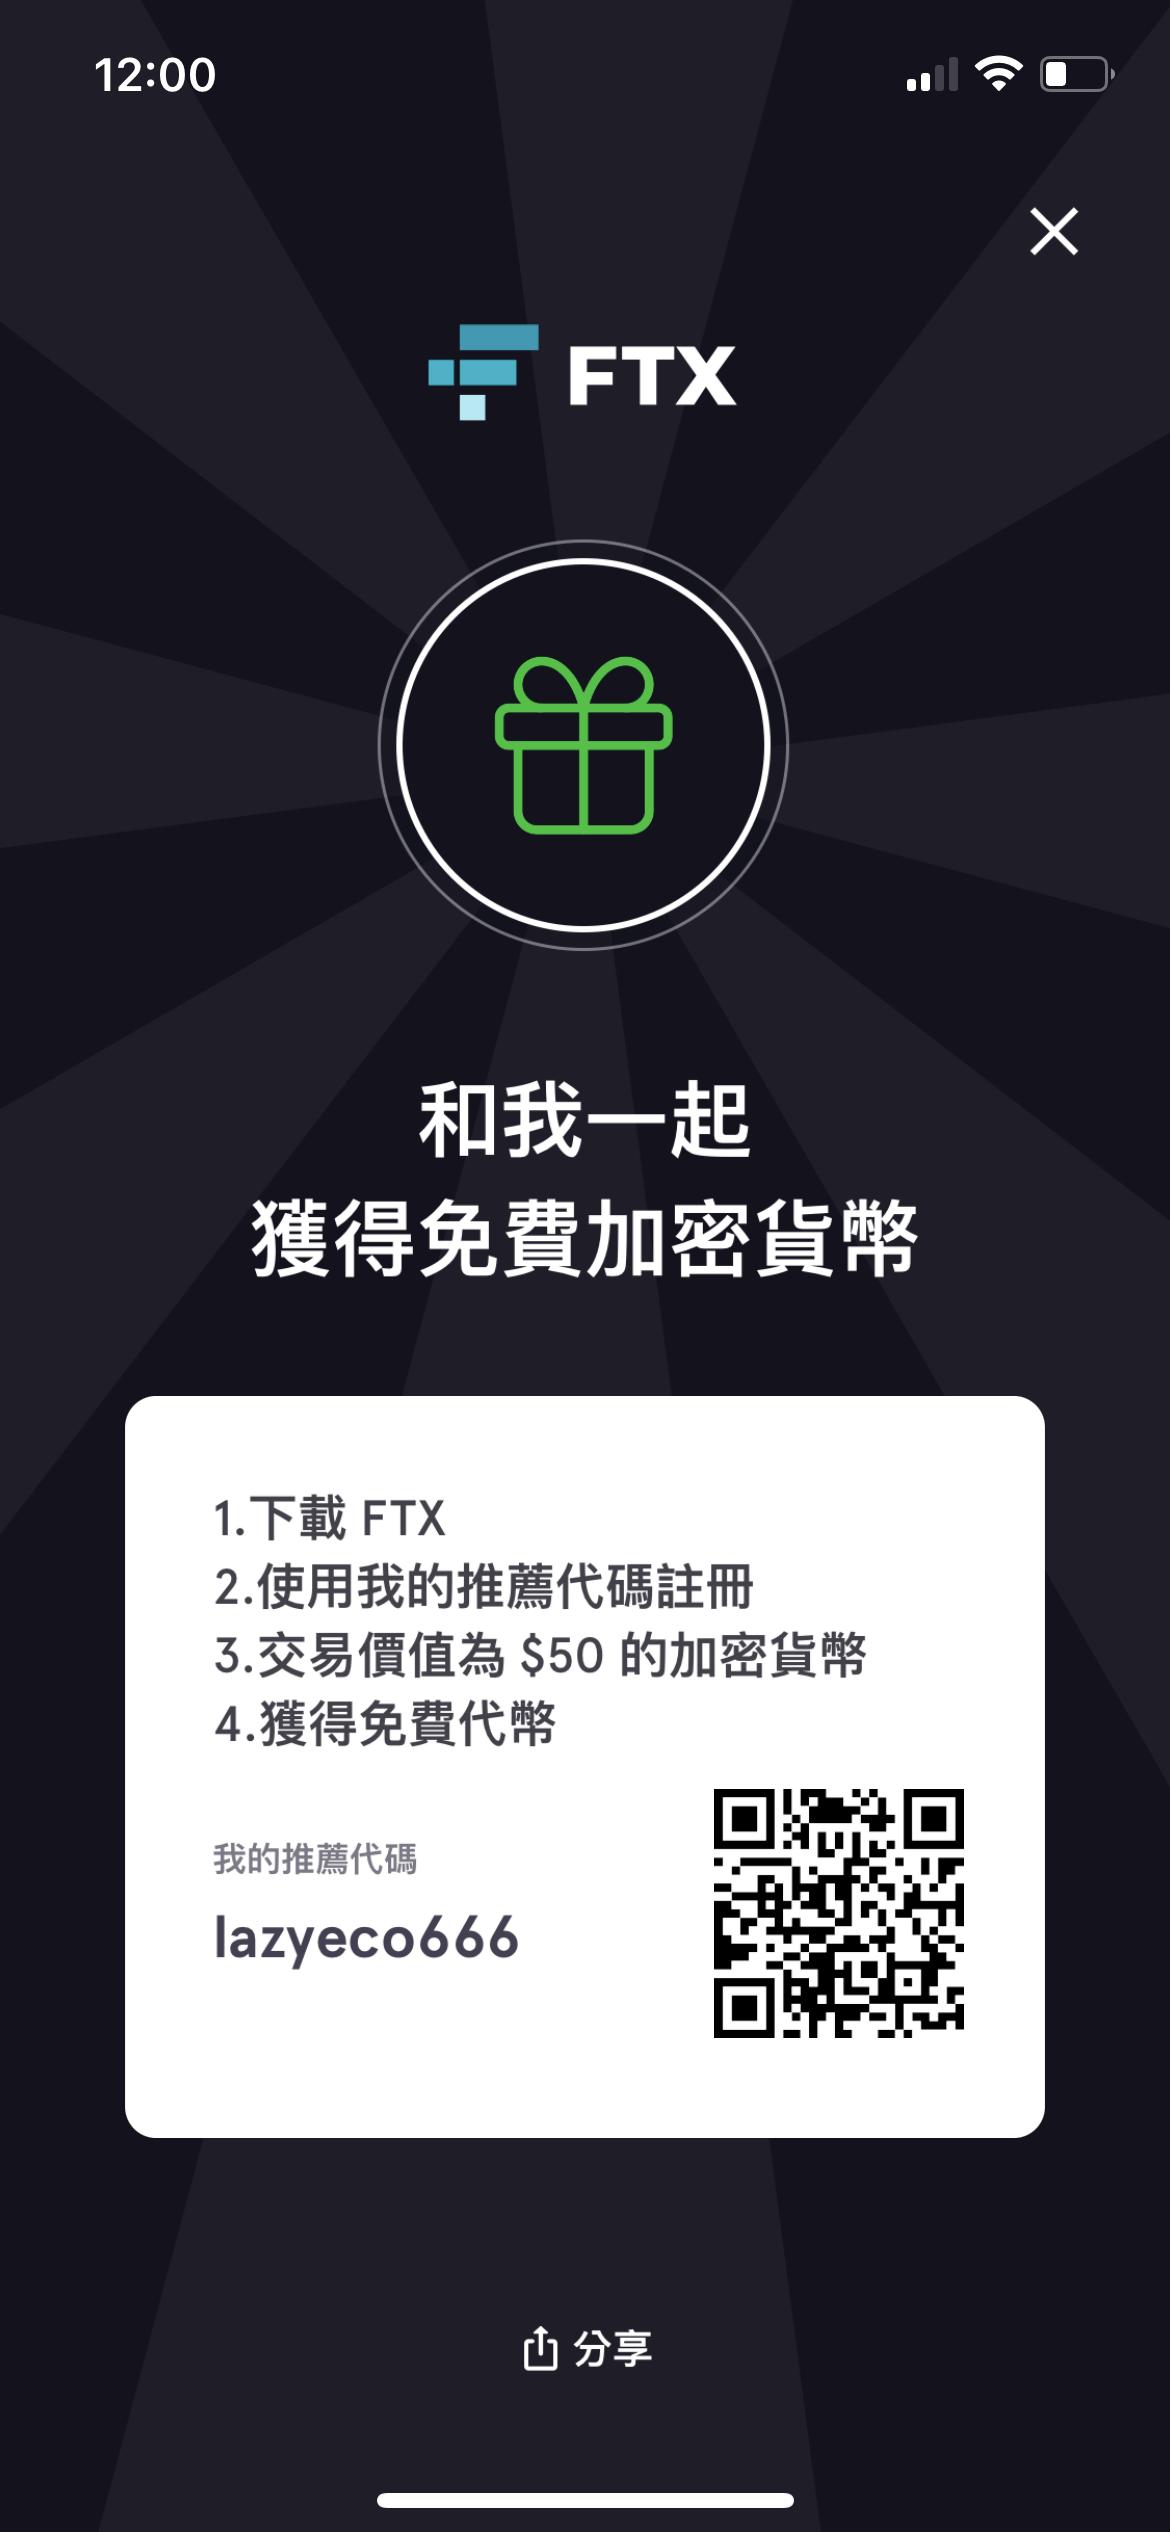 FTX-Blockfolio推薦